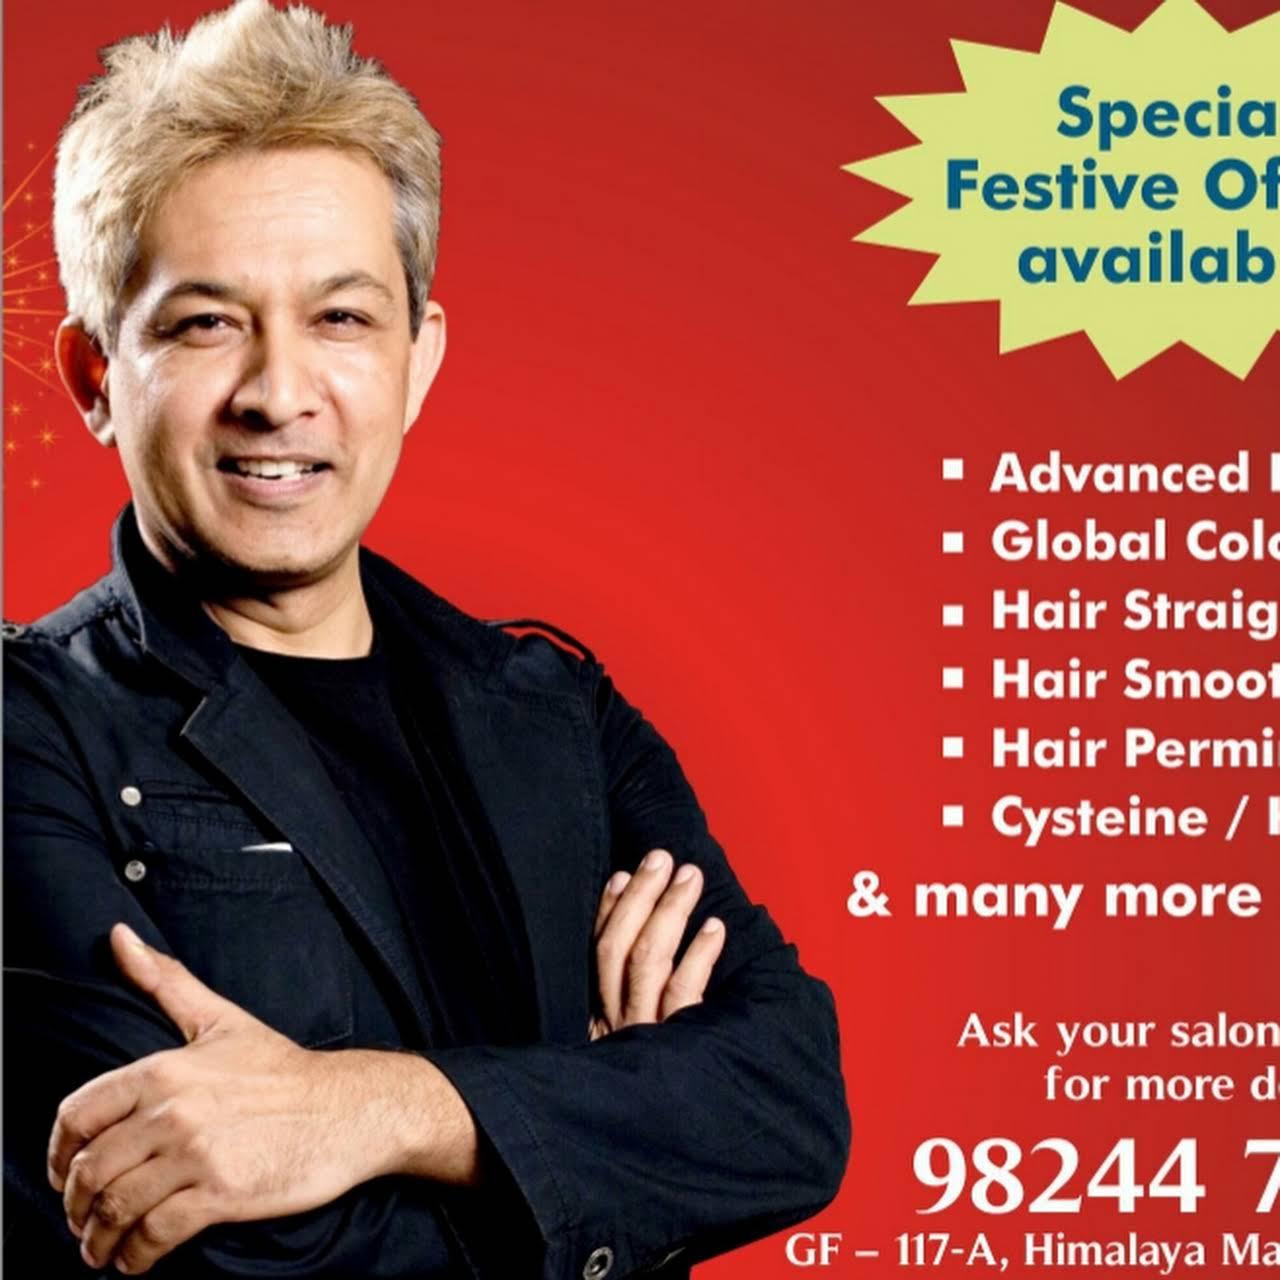 Jawed Habib Hair Beauty Himalaya Mall Hair Is Jawed Habib Style With Fun